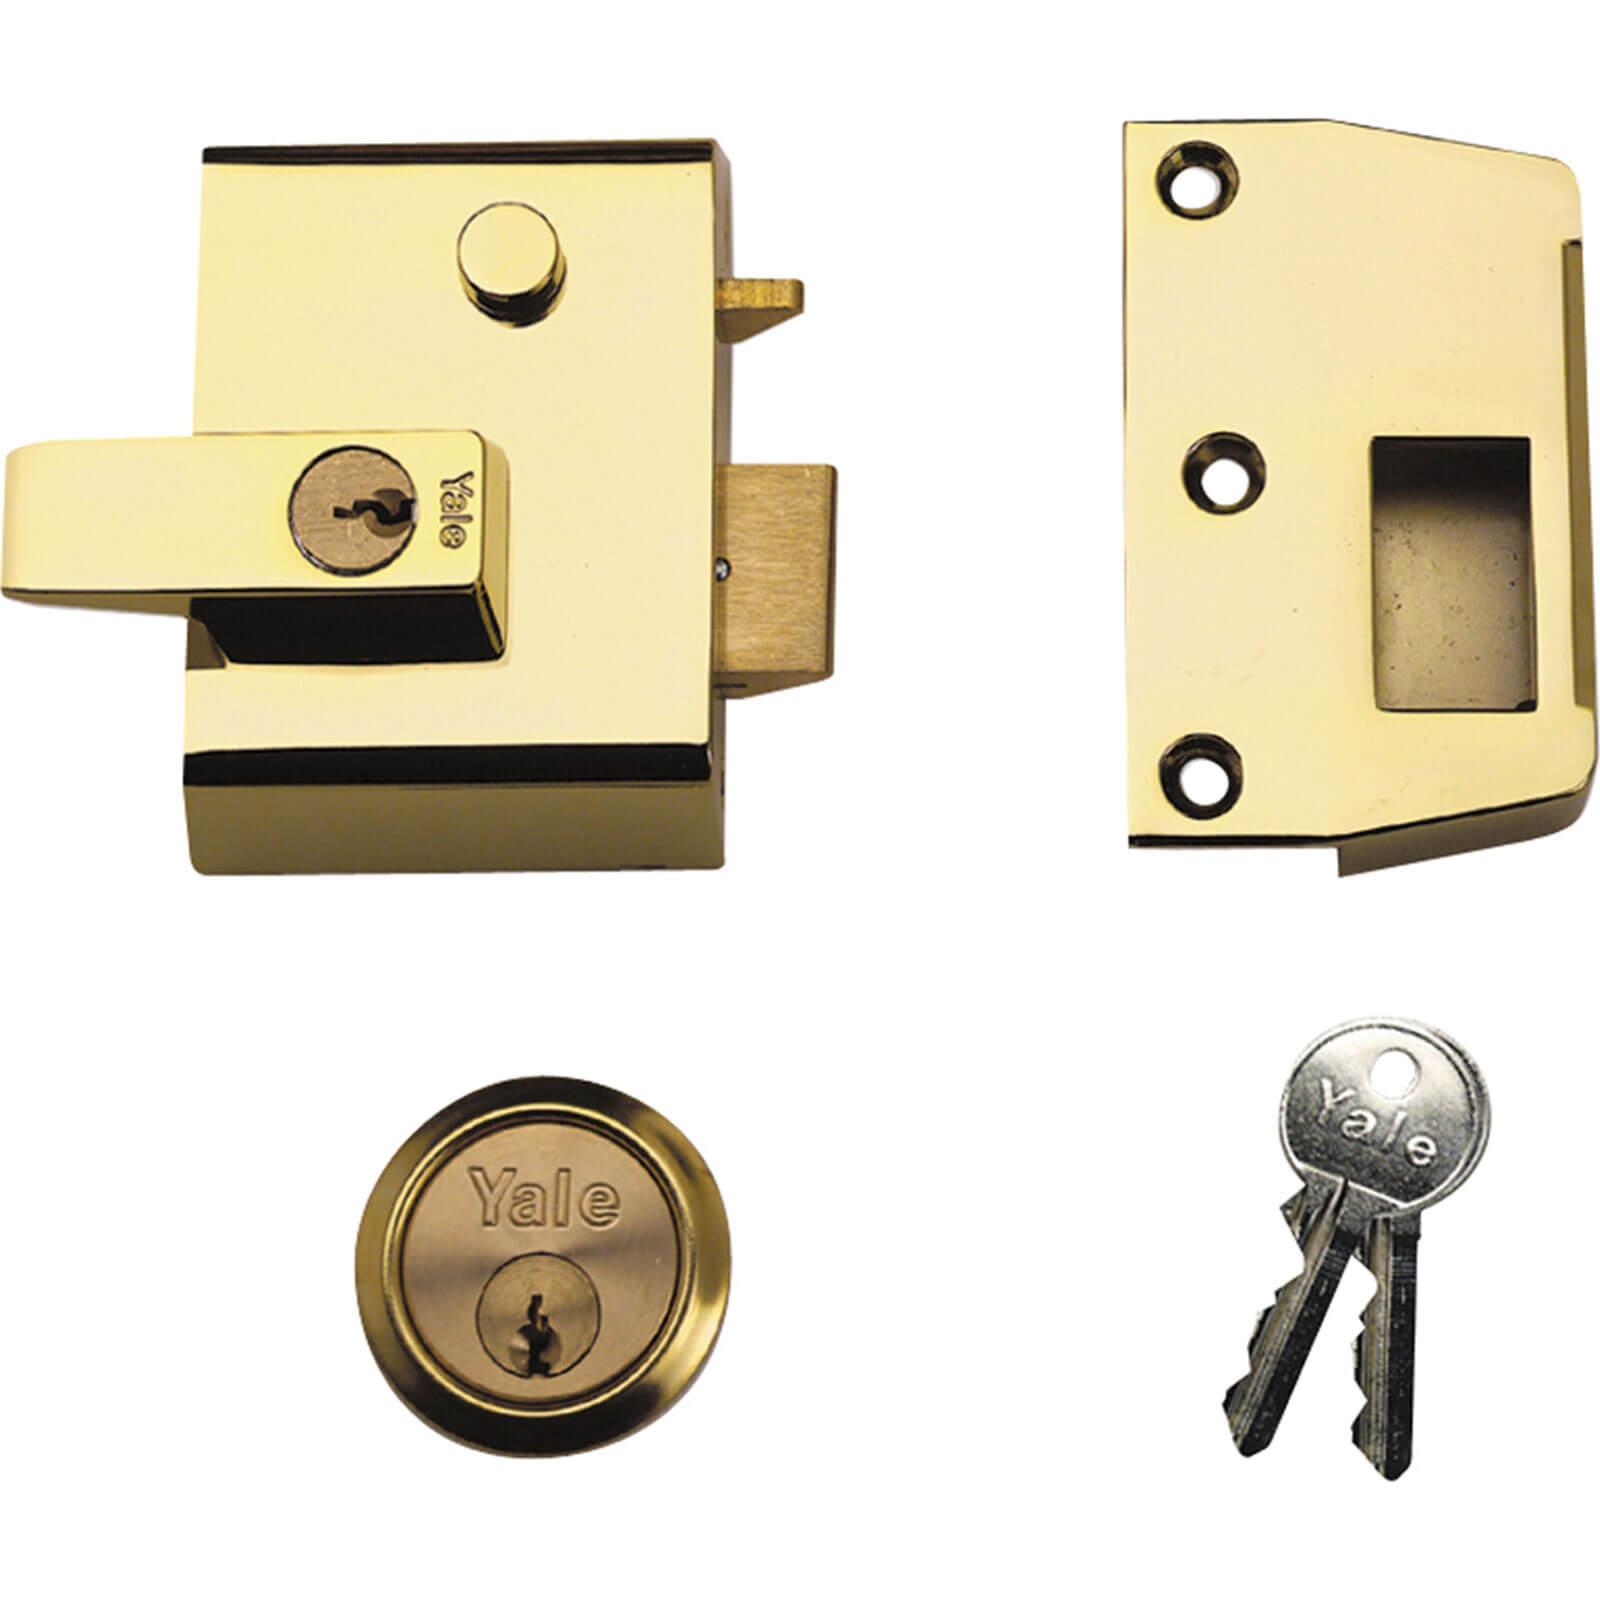 Yale Locks P2 Double Security Nightlatch DMG/PB Finish 40mm Backset